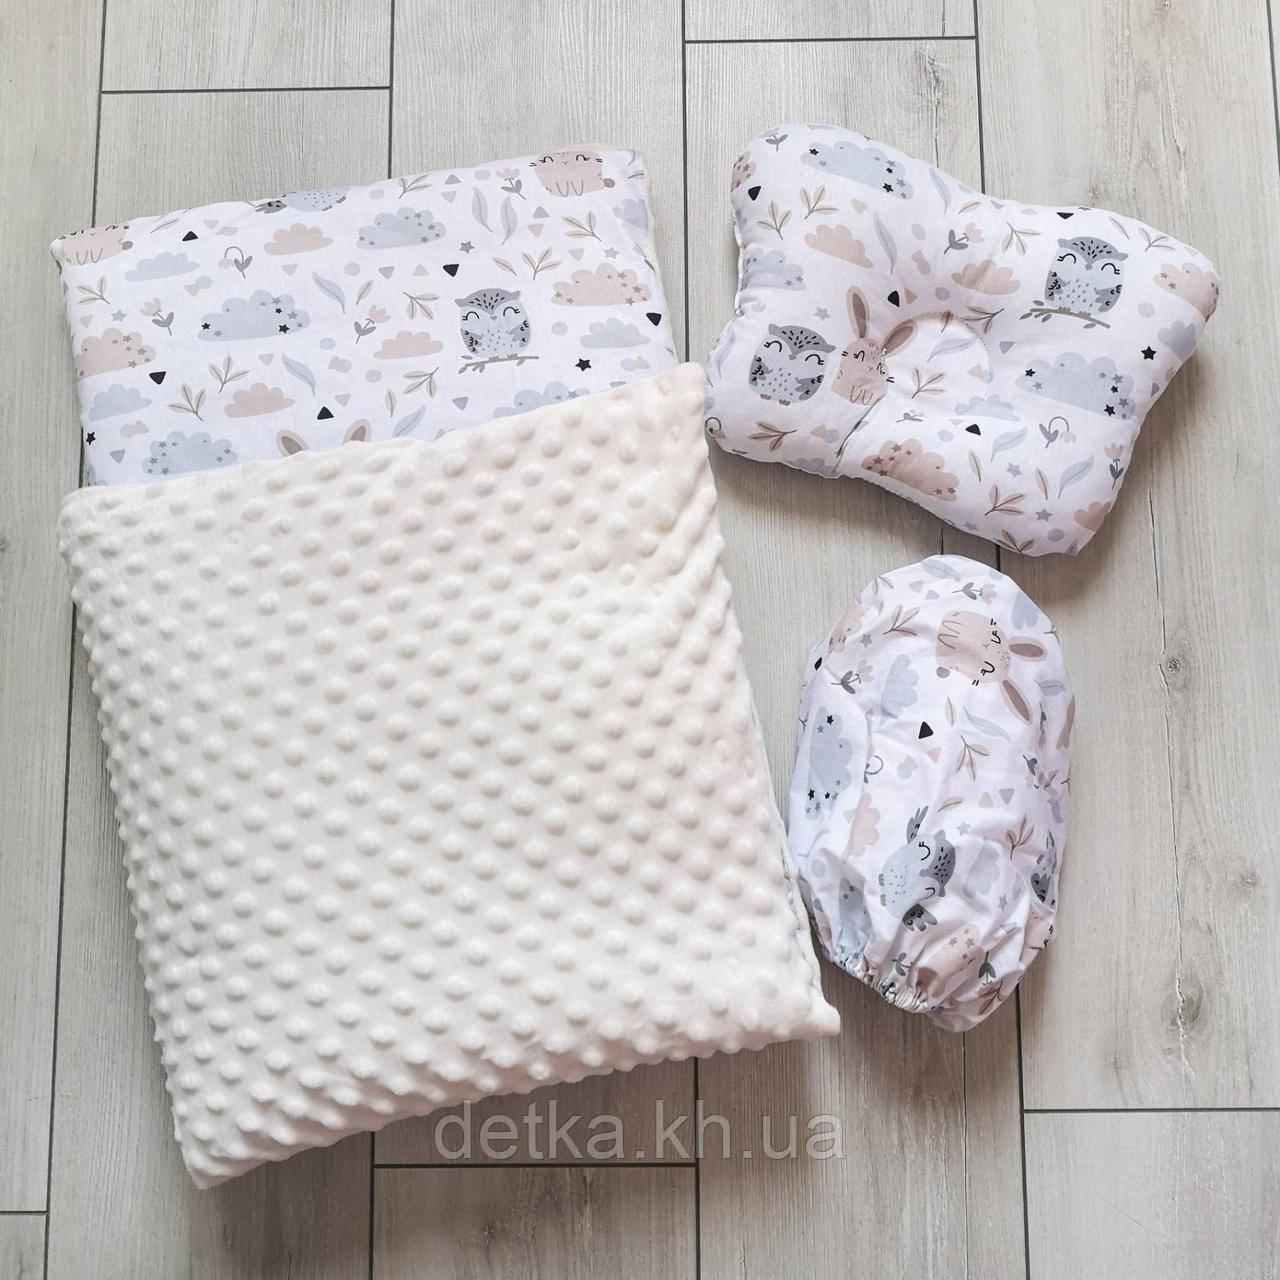 Плед (одеяло) детский, для коляски